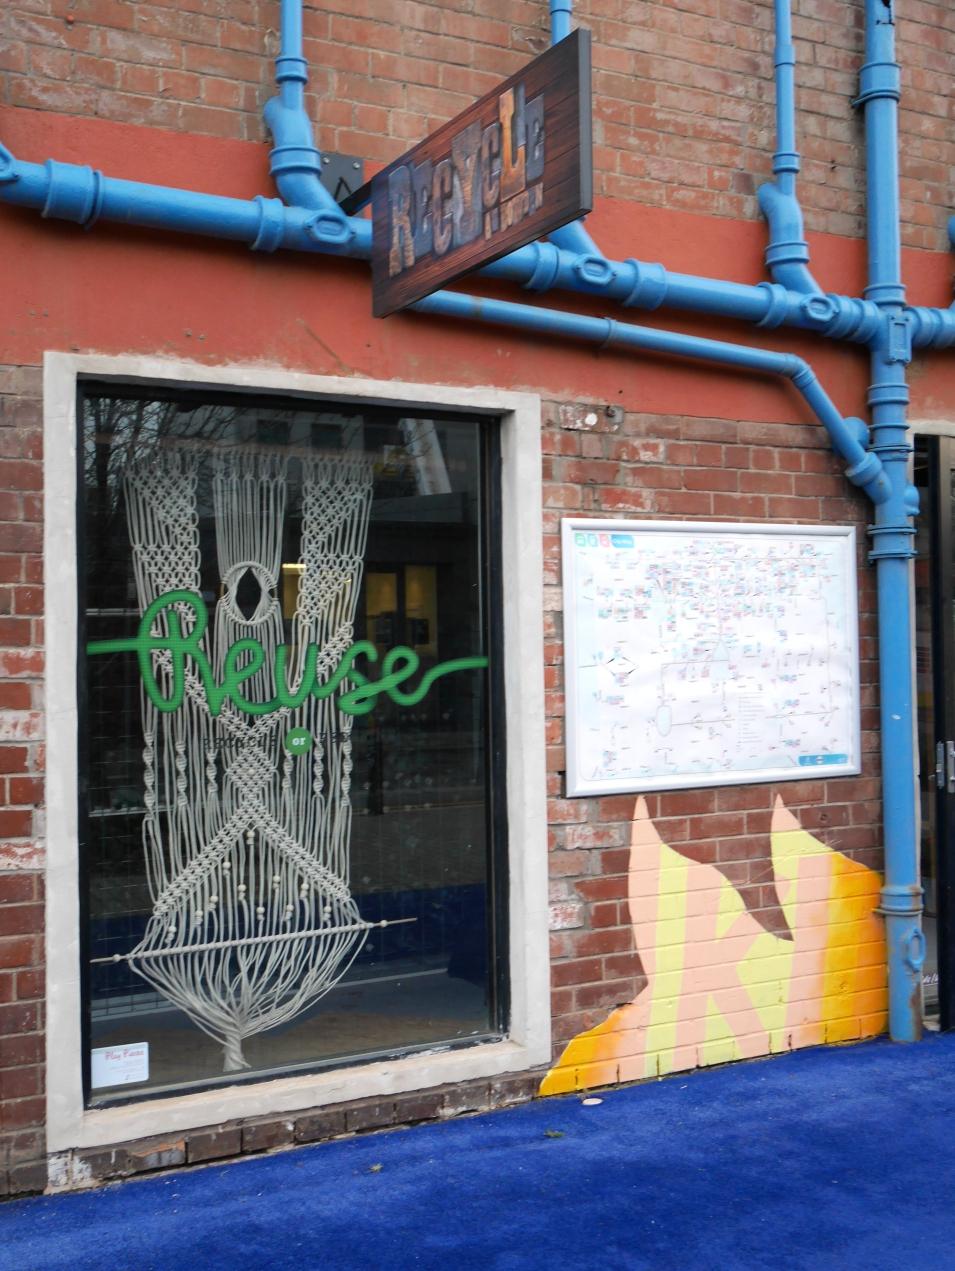 SALA SA living artists Bowden modern macrame and fibre art Adelaide Australia